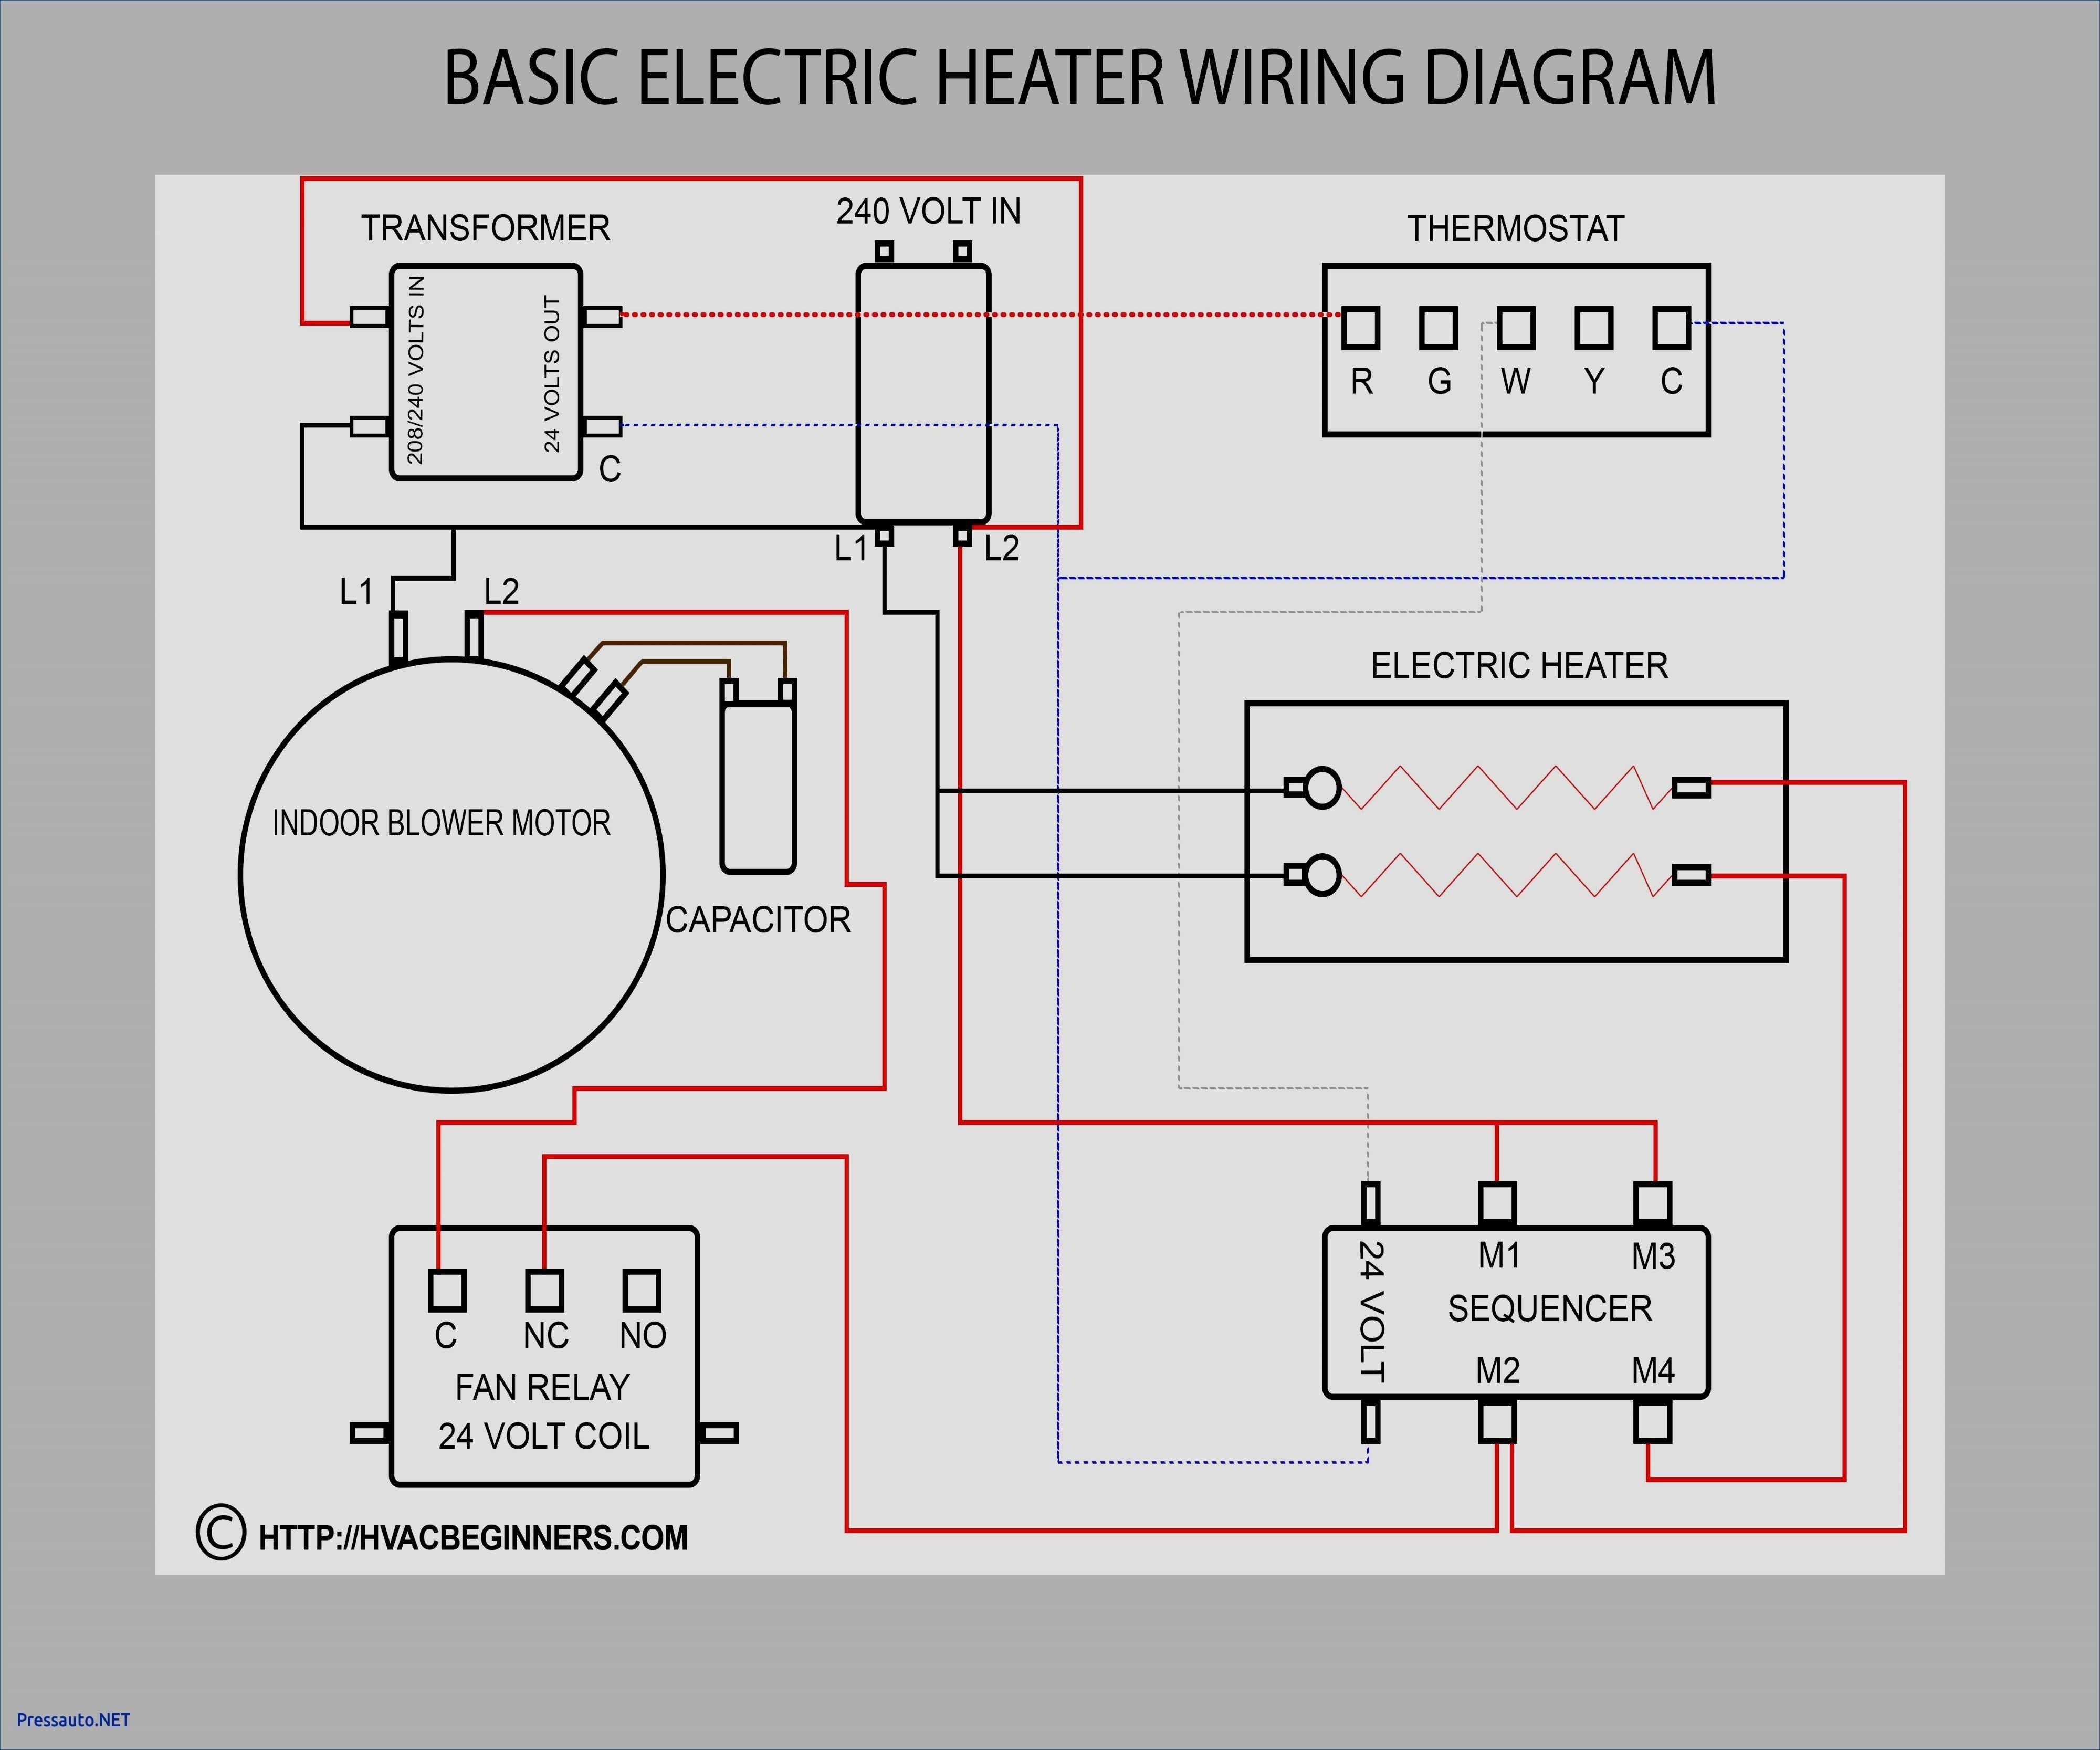 Best Combi Boiler Wiring Diagram Diagram Diagramtemplate Diagramsample Termostato Aire Acondicionado Split Termostato Inteligente